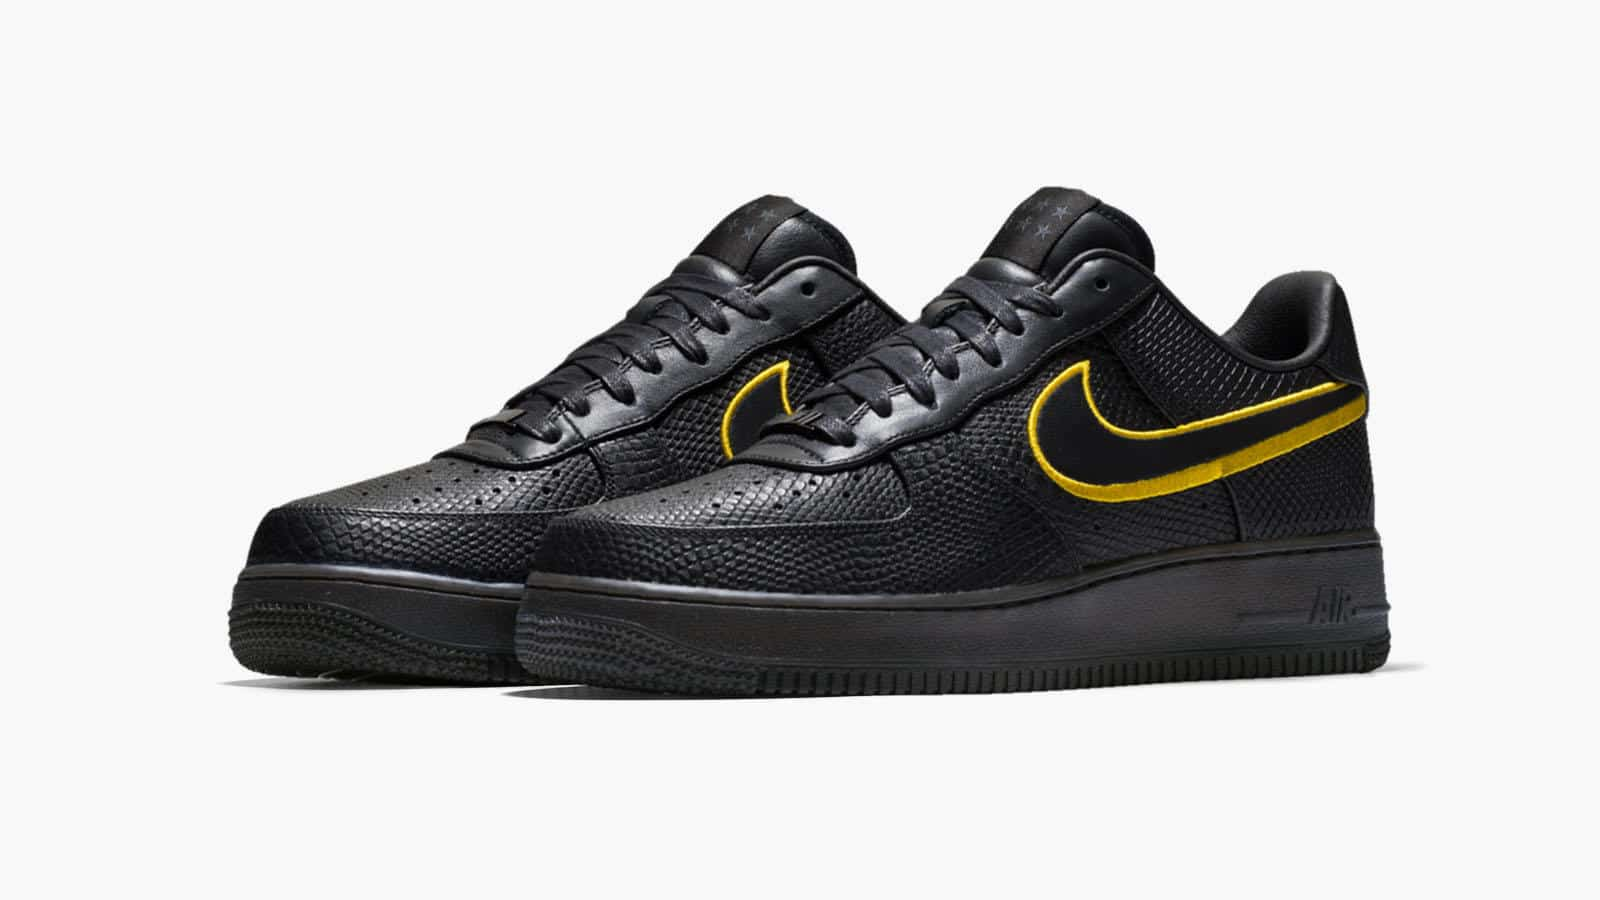 Nike Air Force 1 Low Black Mamba, l'ultime hommage à Kobe